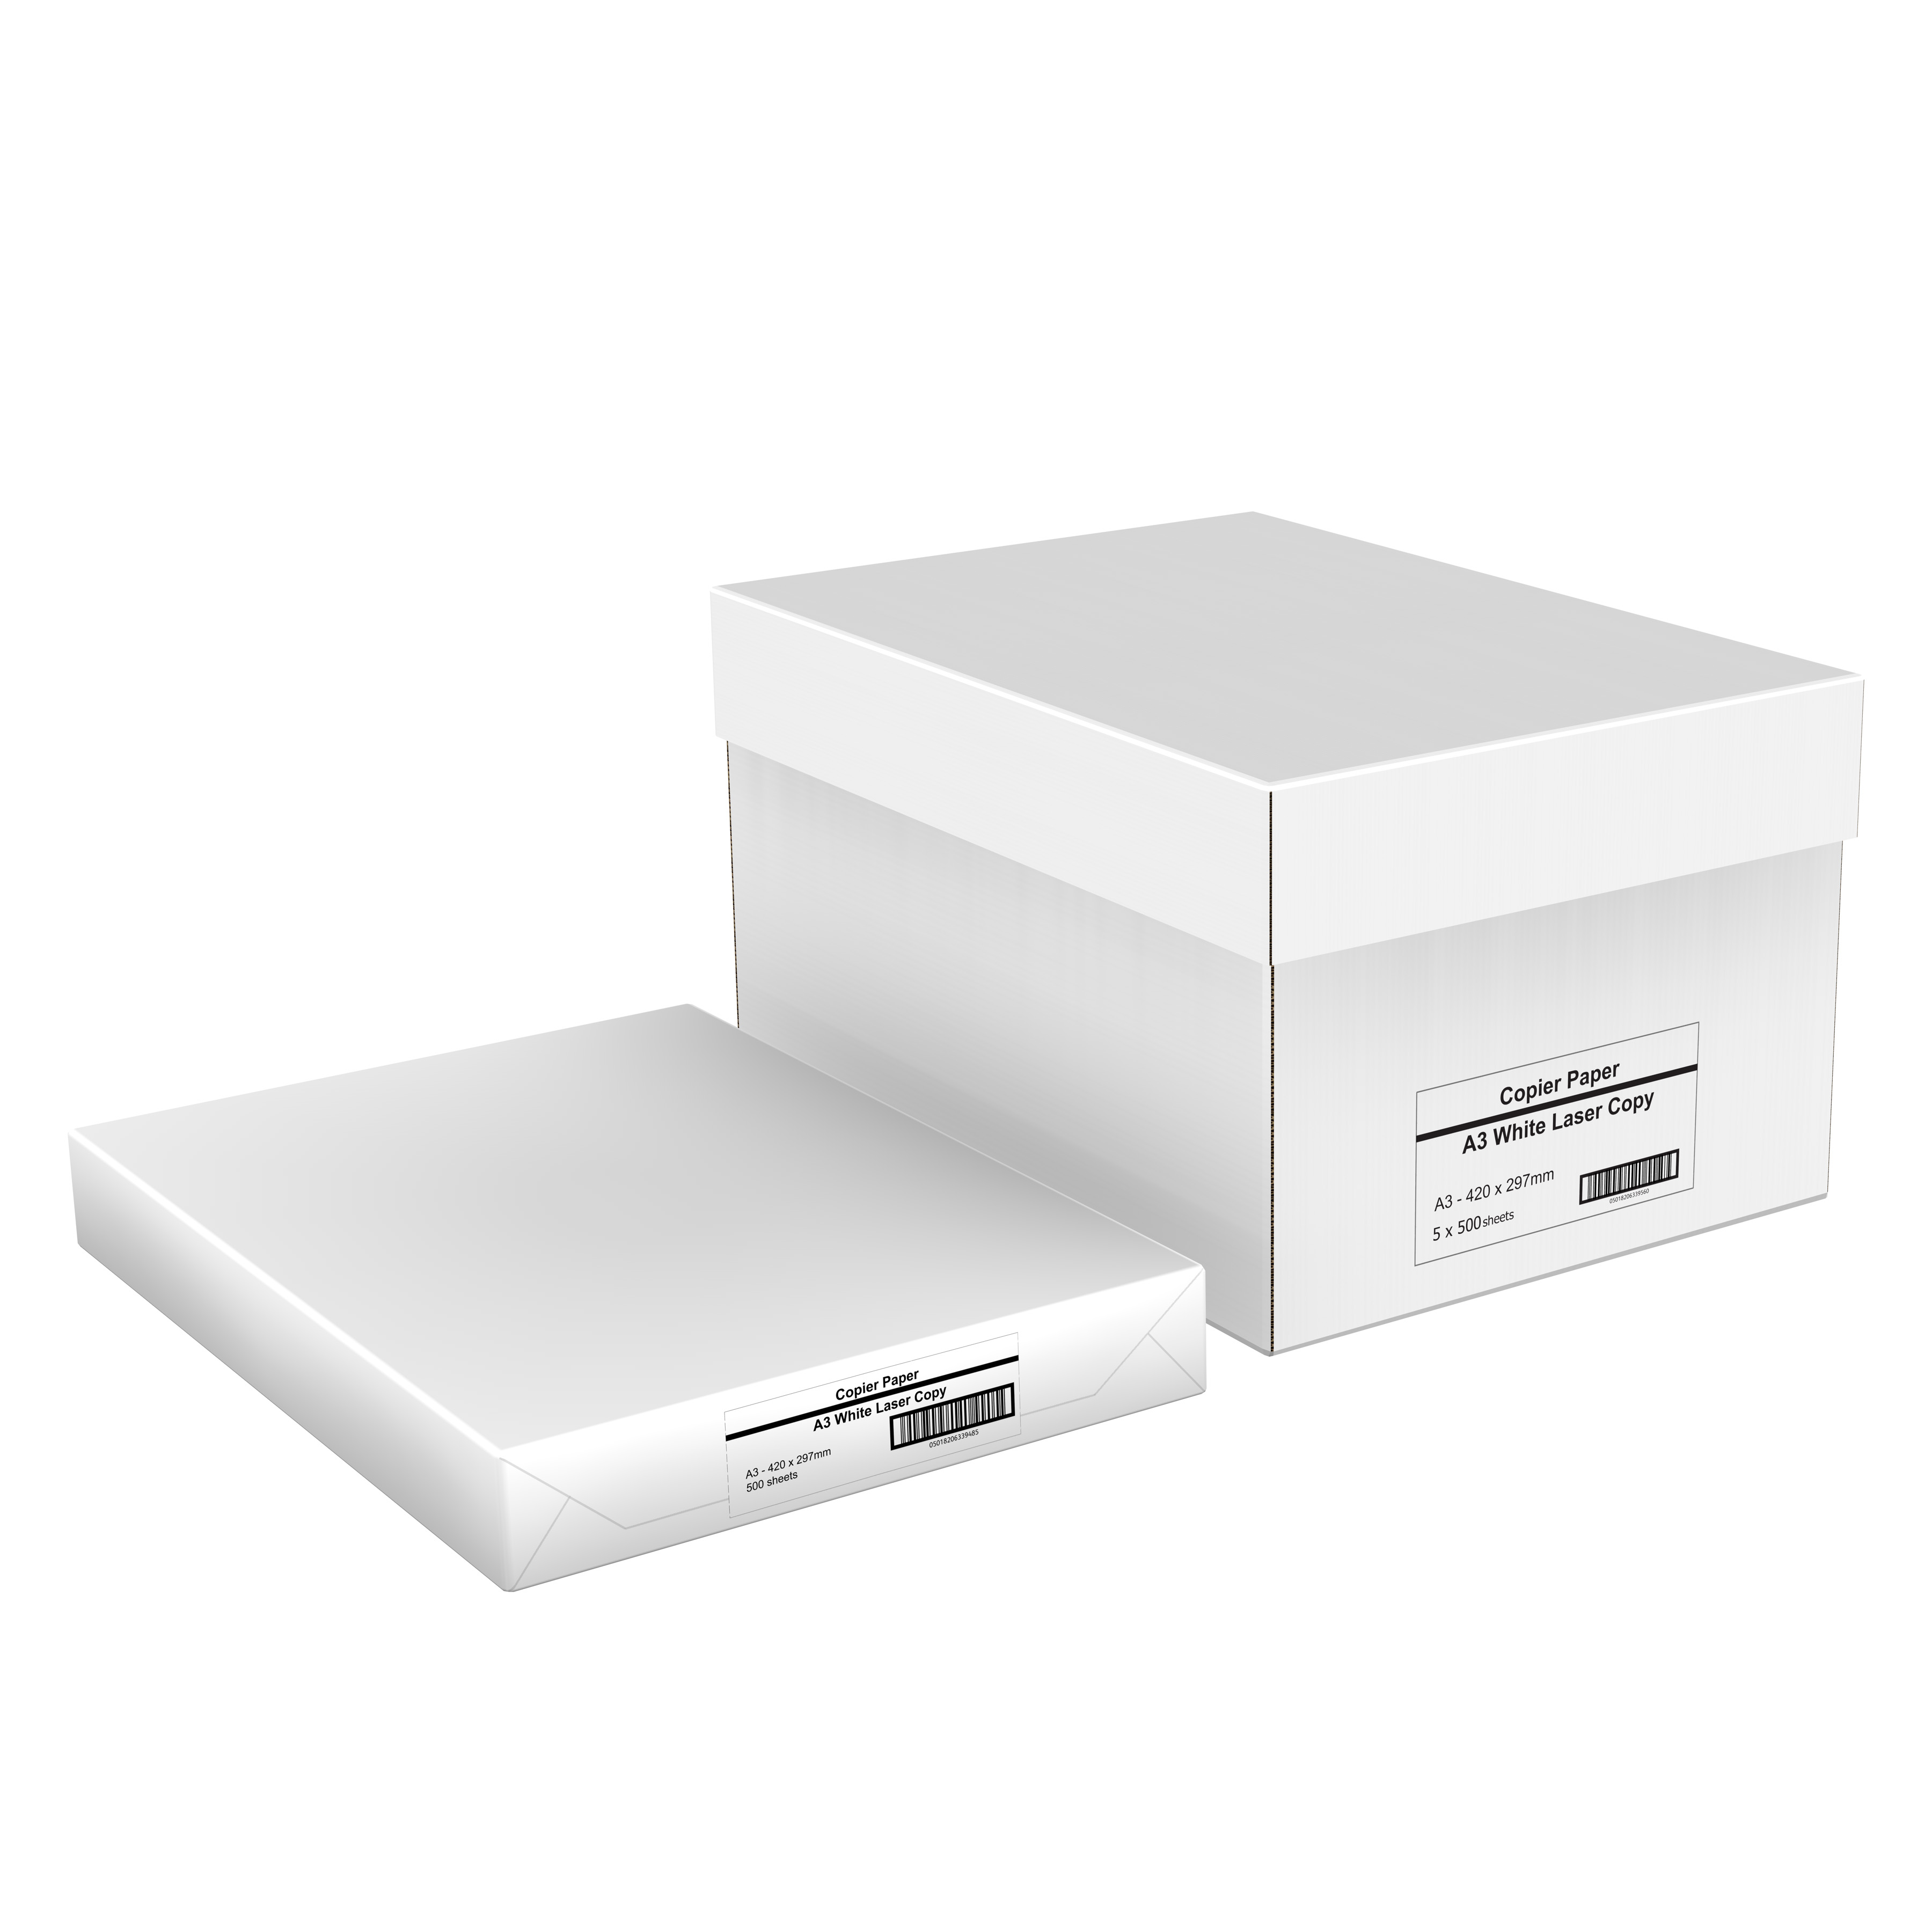 WhiteBox Paper A3 White 500 Sheets